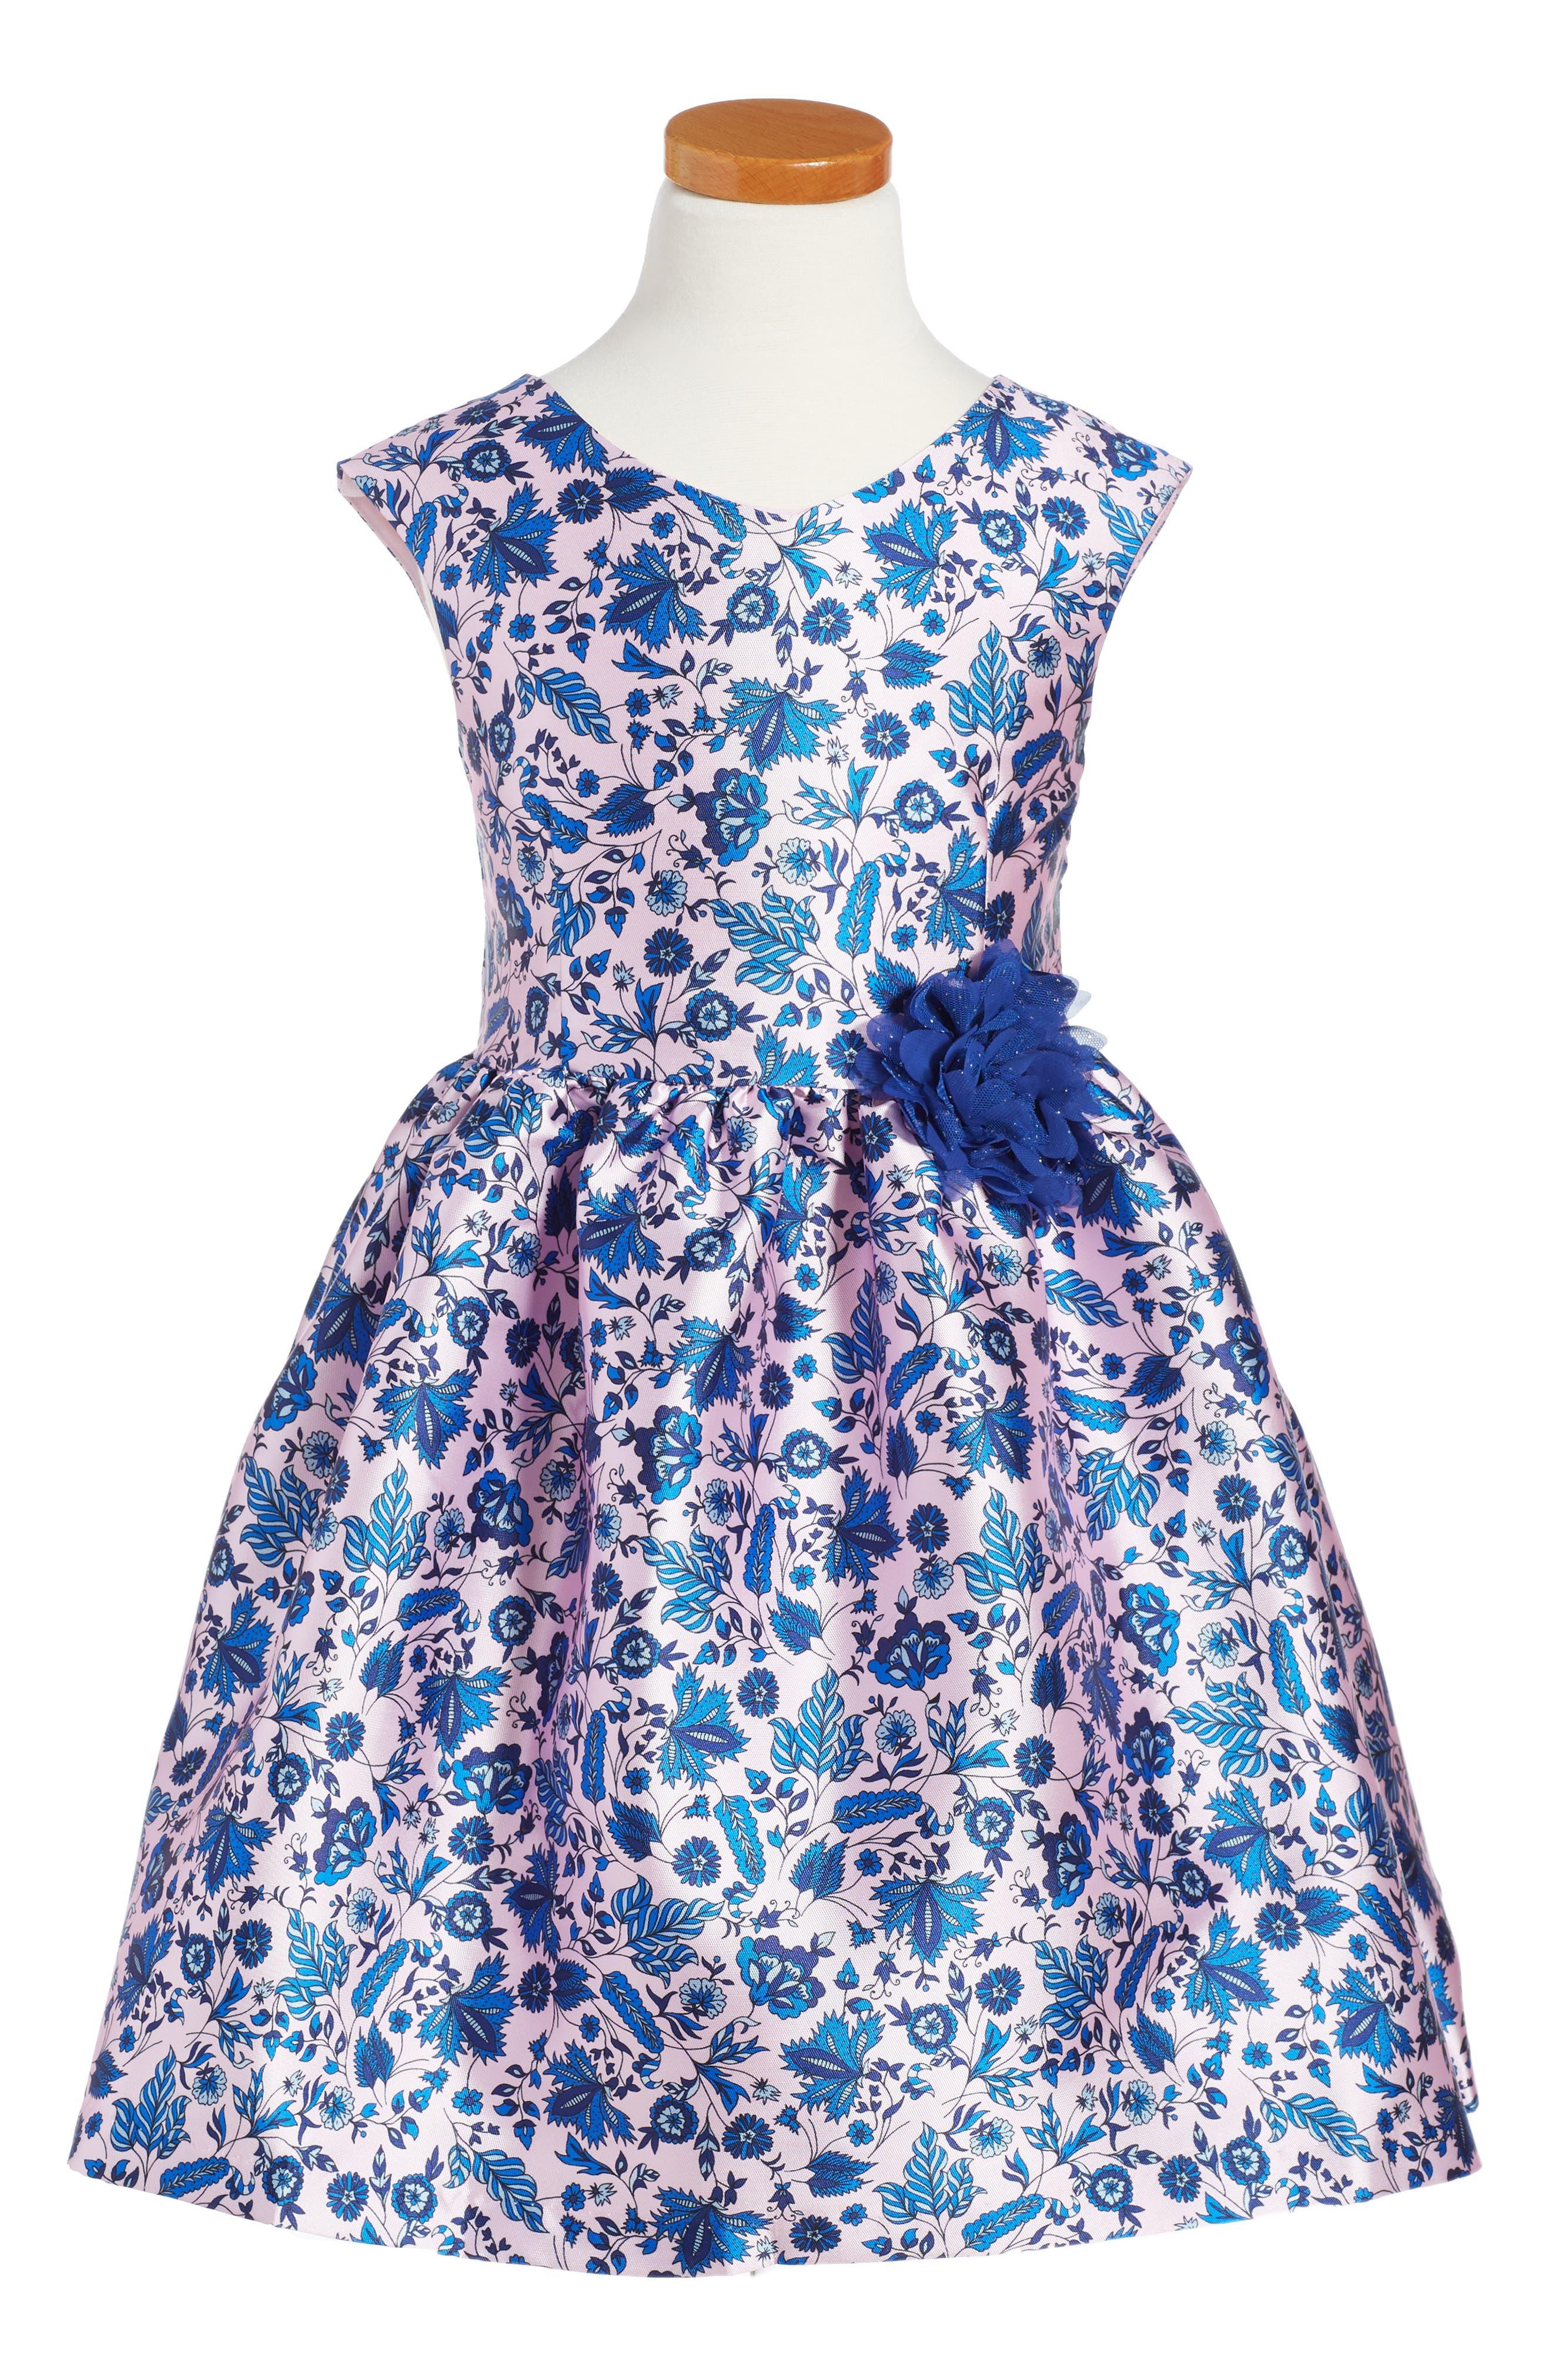 Alternate Image 1 Selected - Pippa & Julie Print Fit & Flare Dress (Toddler Girls, Little Girls & Big Girls)